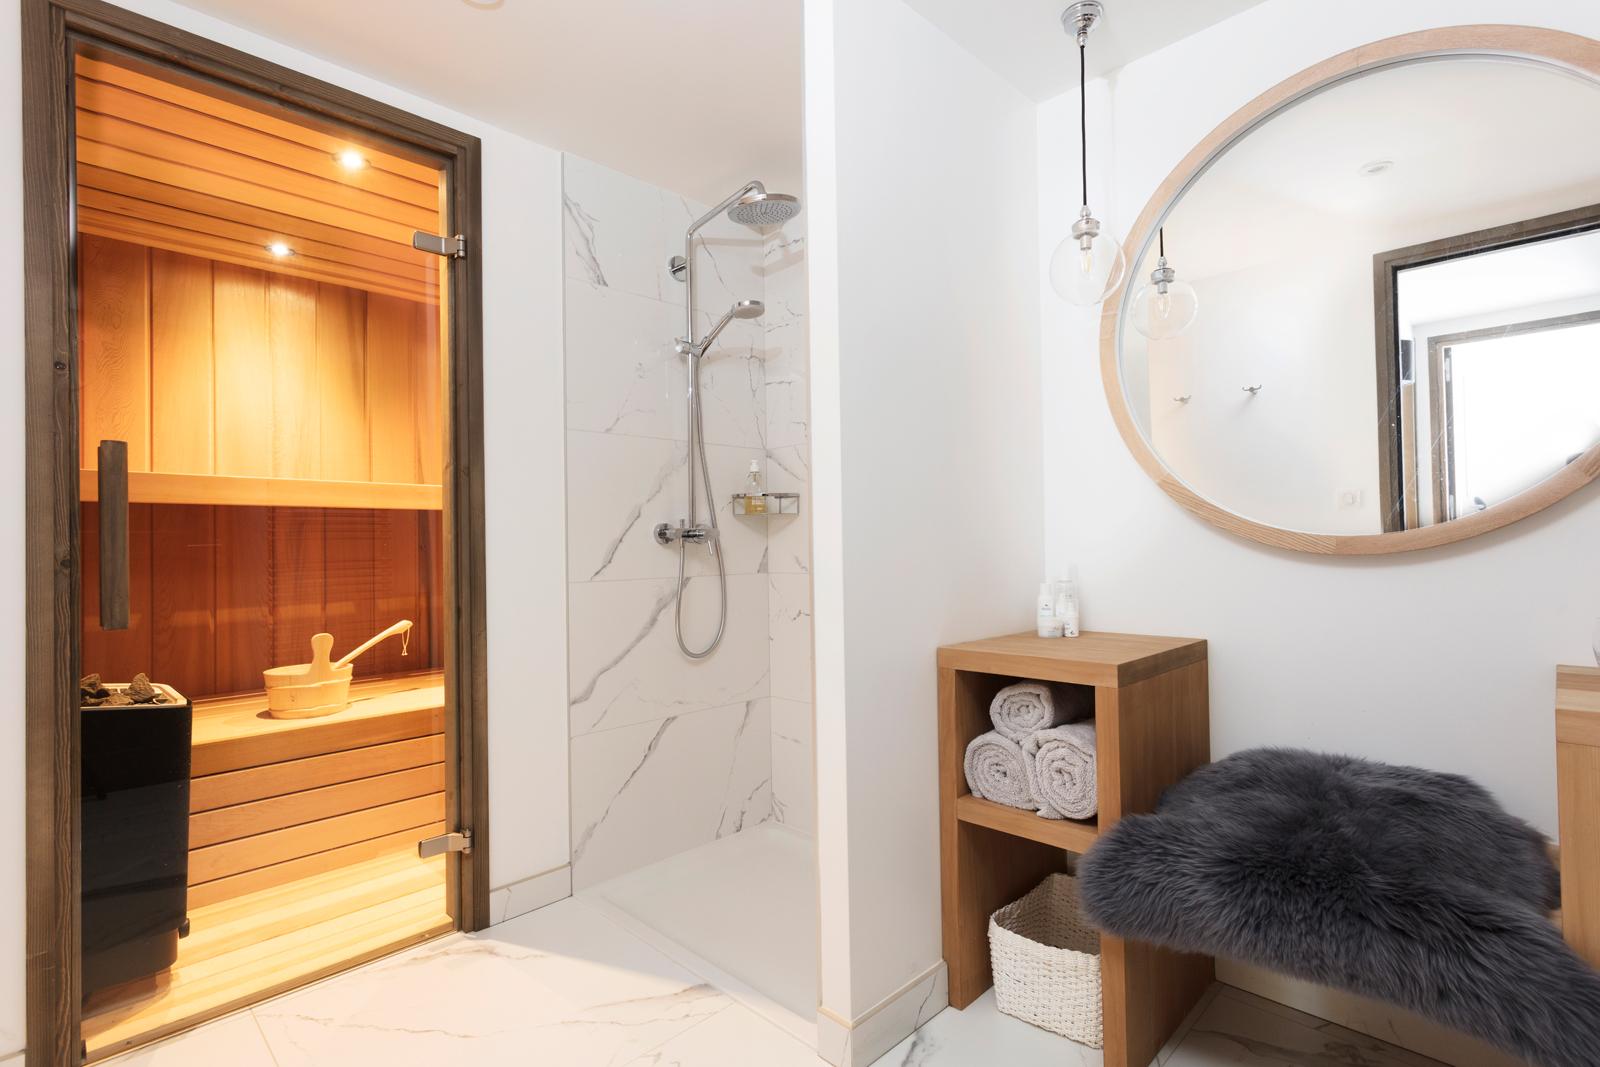 Chalet Mirabelle's super-relaxing sauna